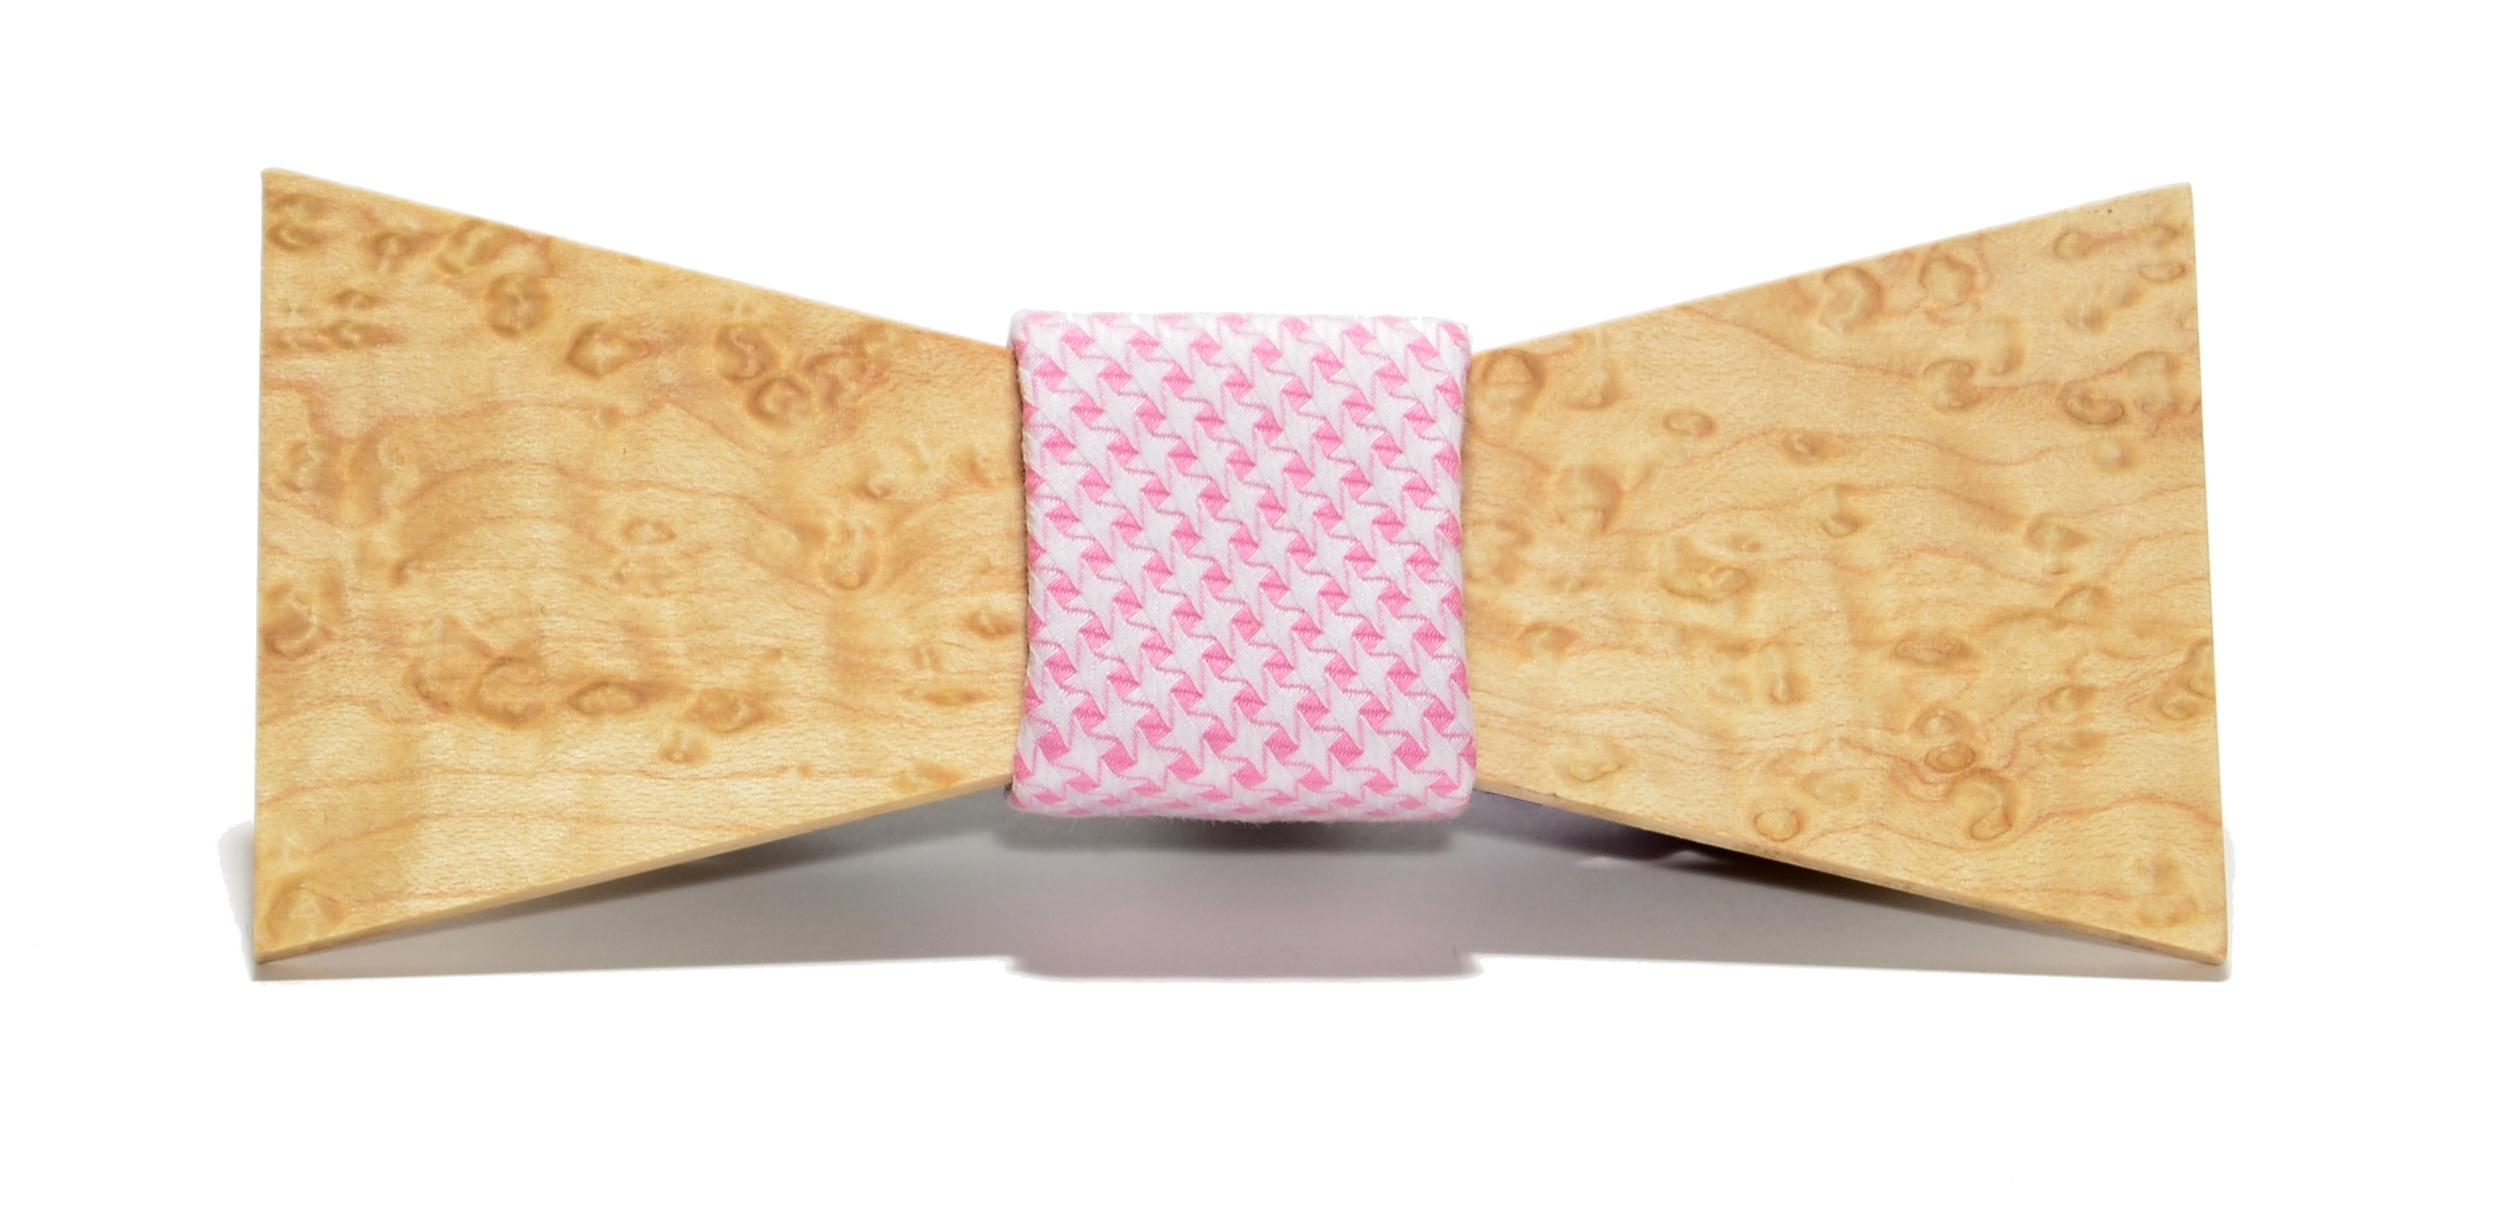 The Belmont Birdseye Maple Shorty Cotton Wooden Bow Tie